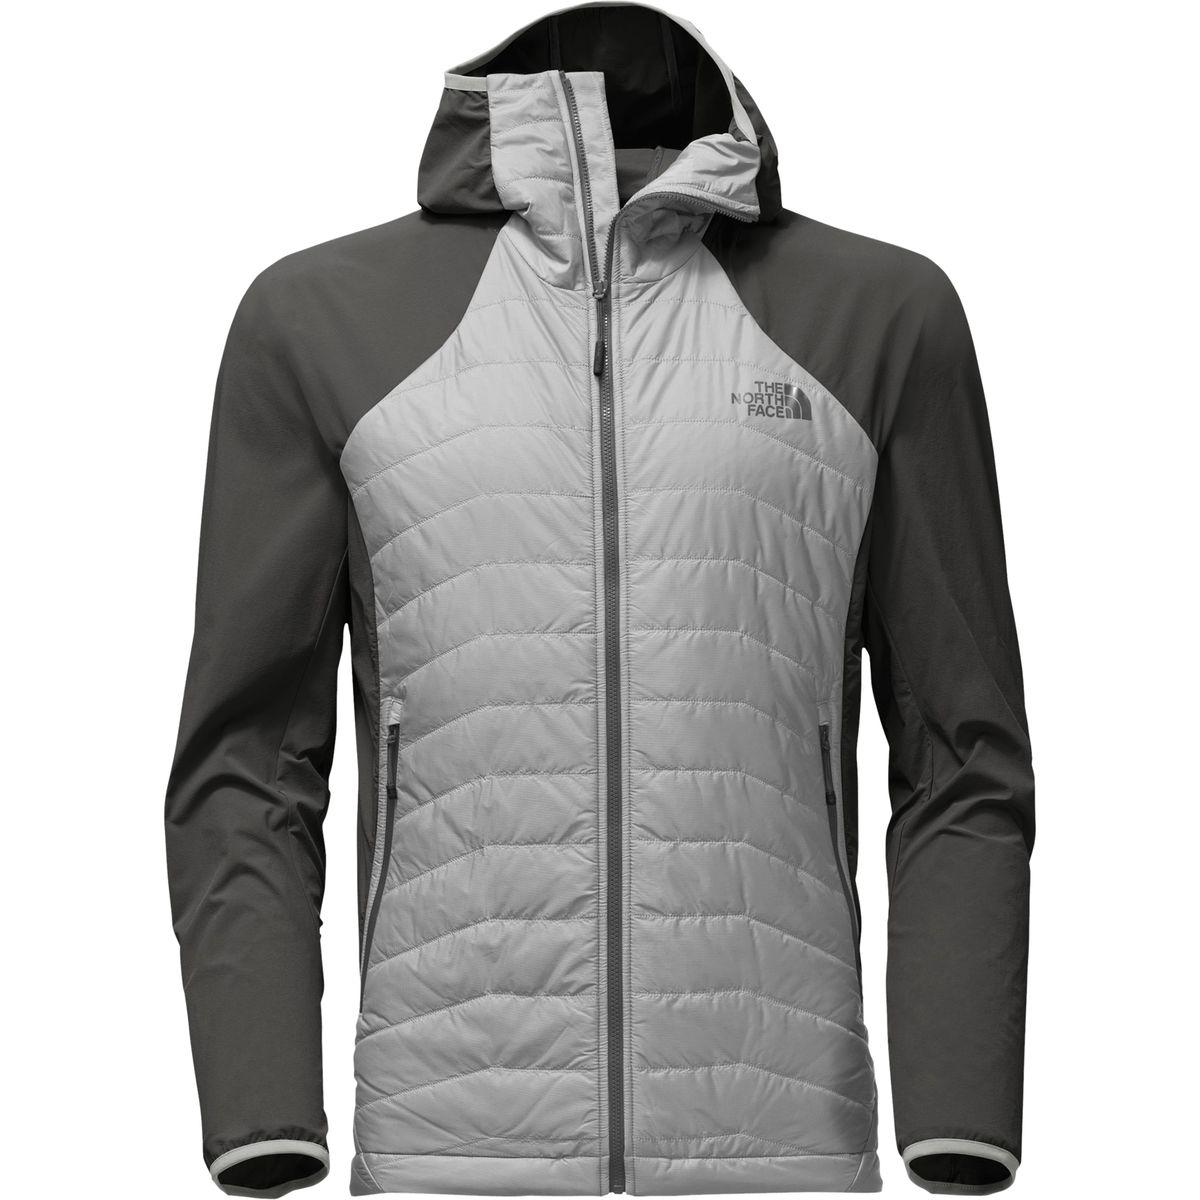 The North Face Progressor Insulated Hybrid Hooded Jacket - Men